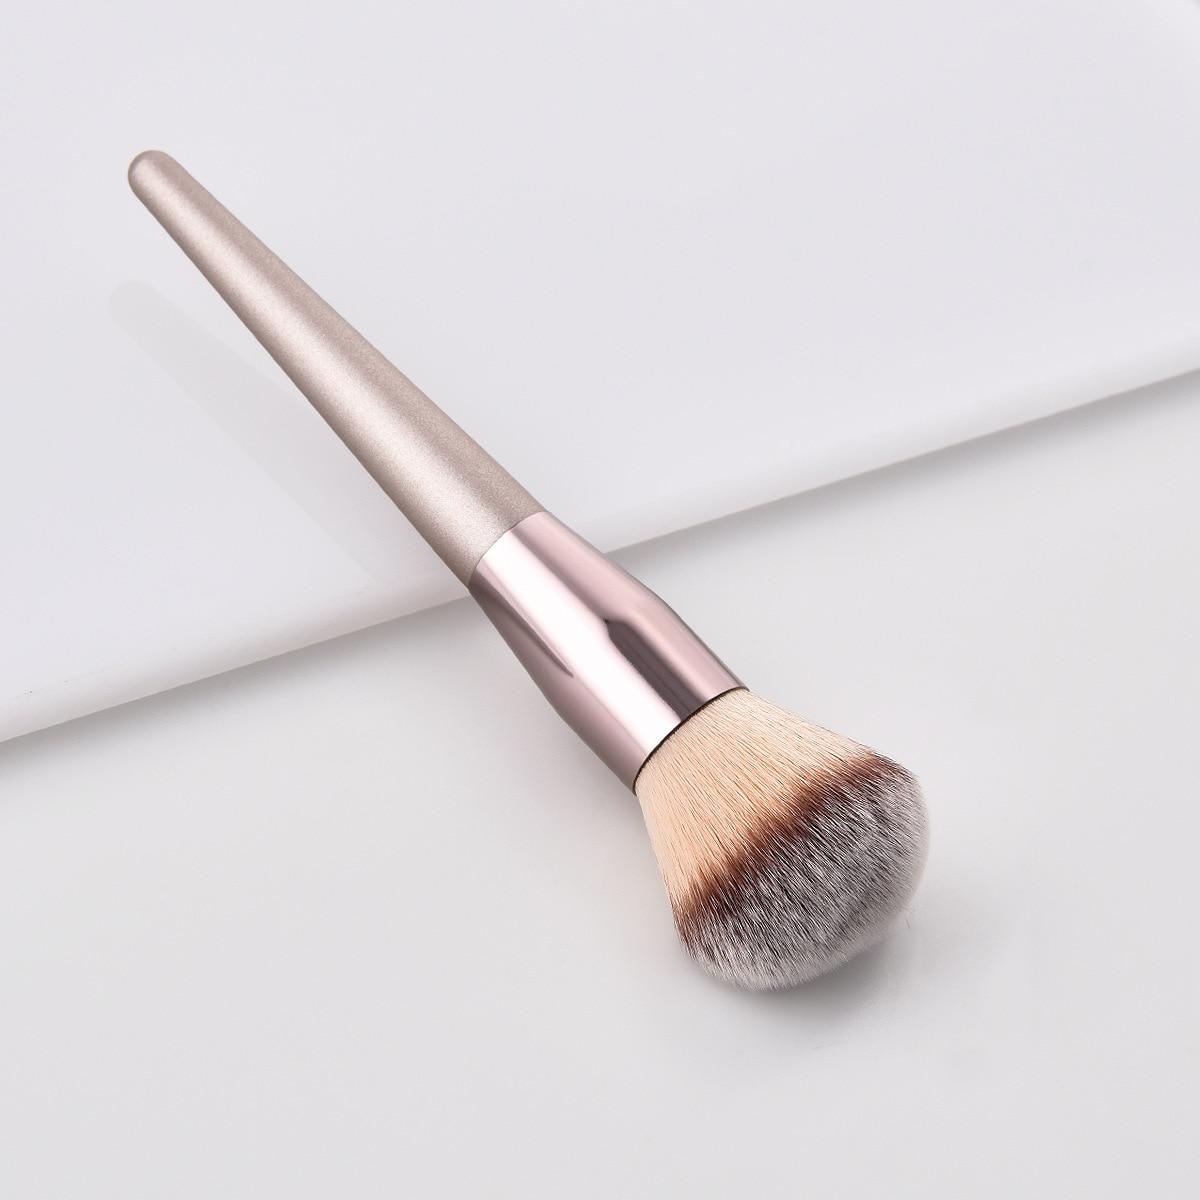 Brochas de Lujo Champagne maquillaje pinceles para Blush de sombra